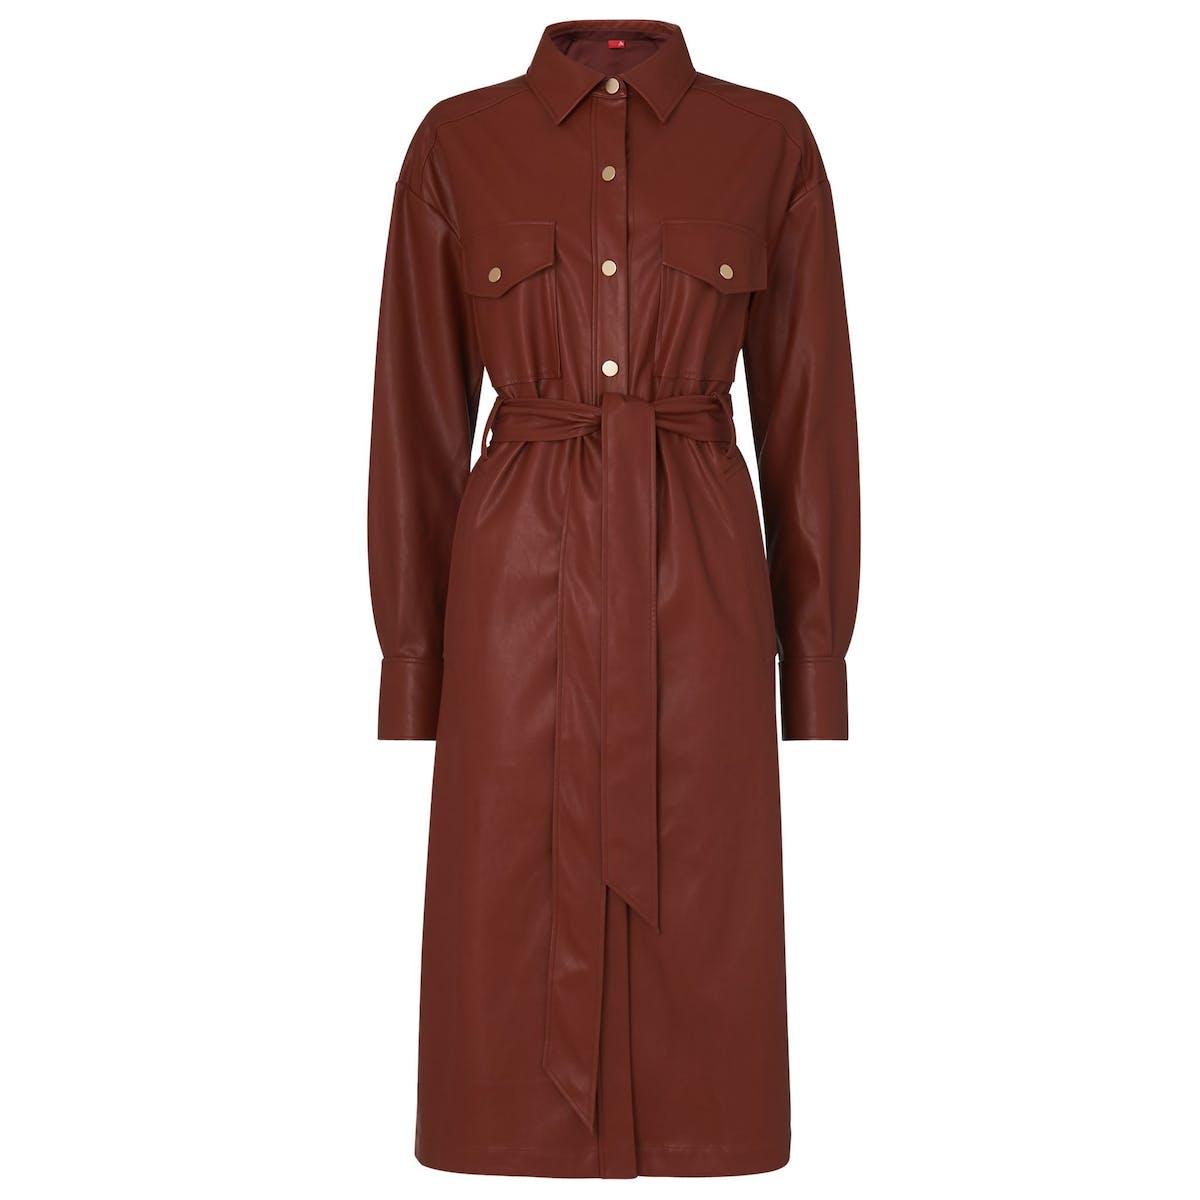 ec572022b4ec Vegan leather dress, £165, kitristudio.com